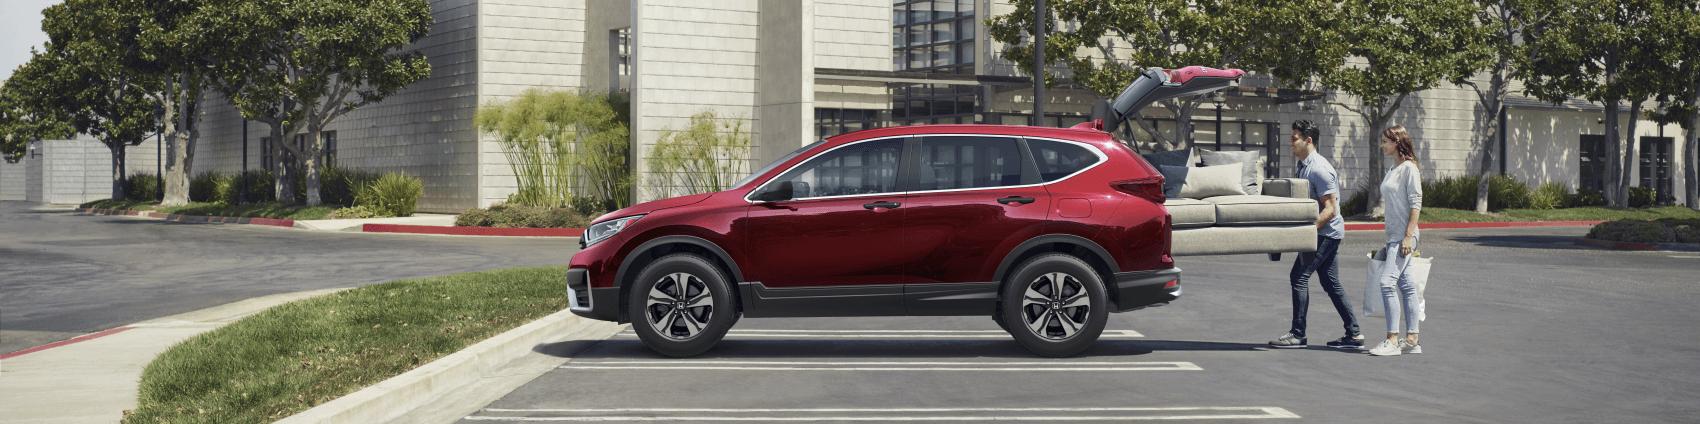 2021 Honda CR-V Red